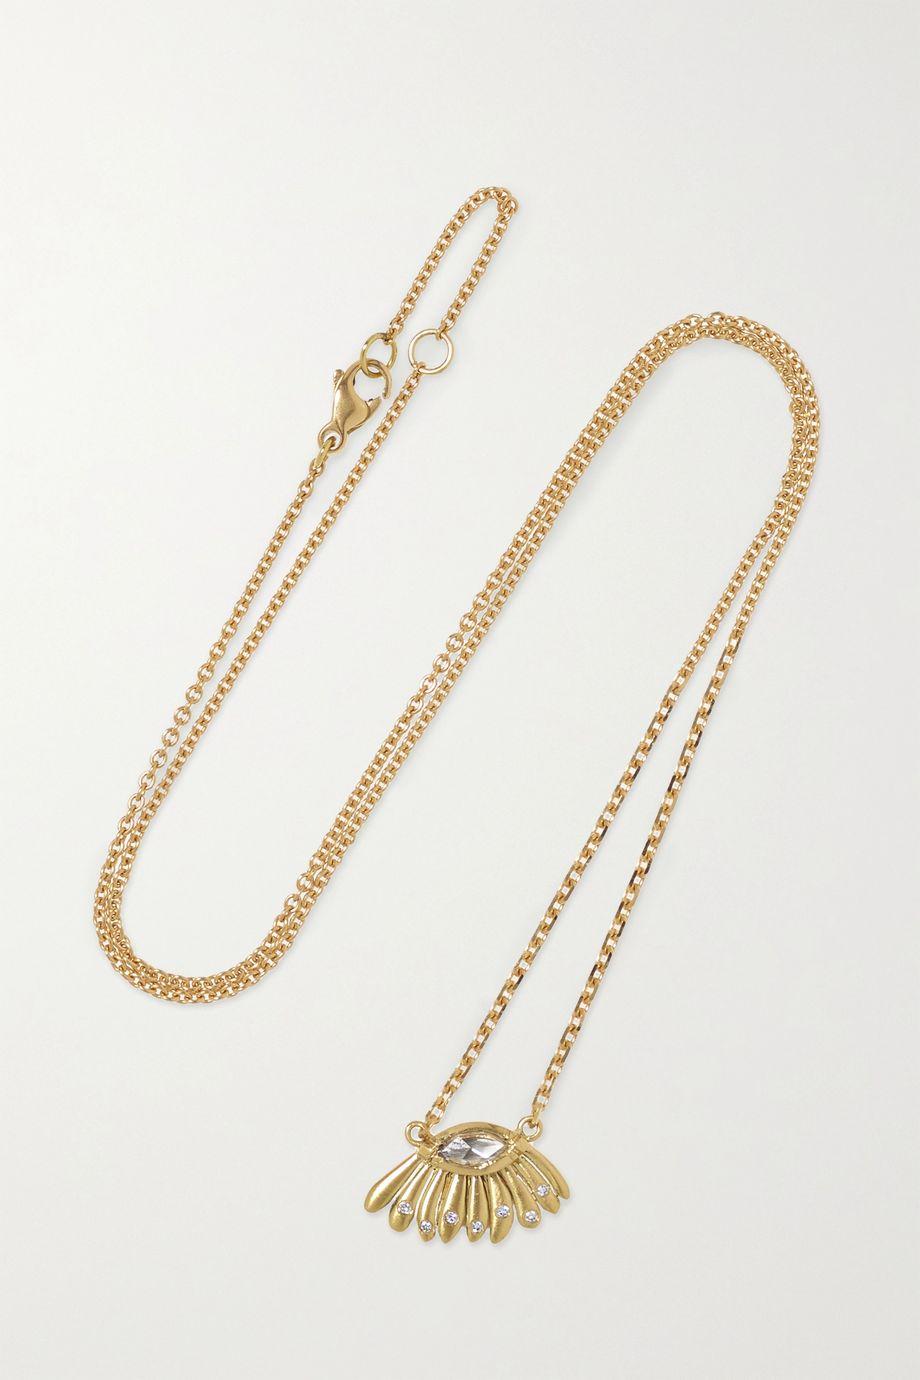 Brooke Gregson Daisy Dewdrop 18-karat gold diamond necklace